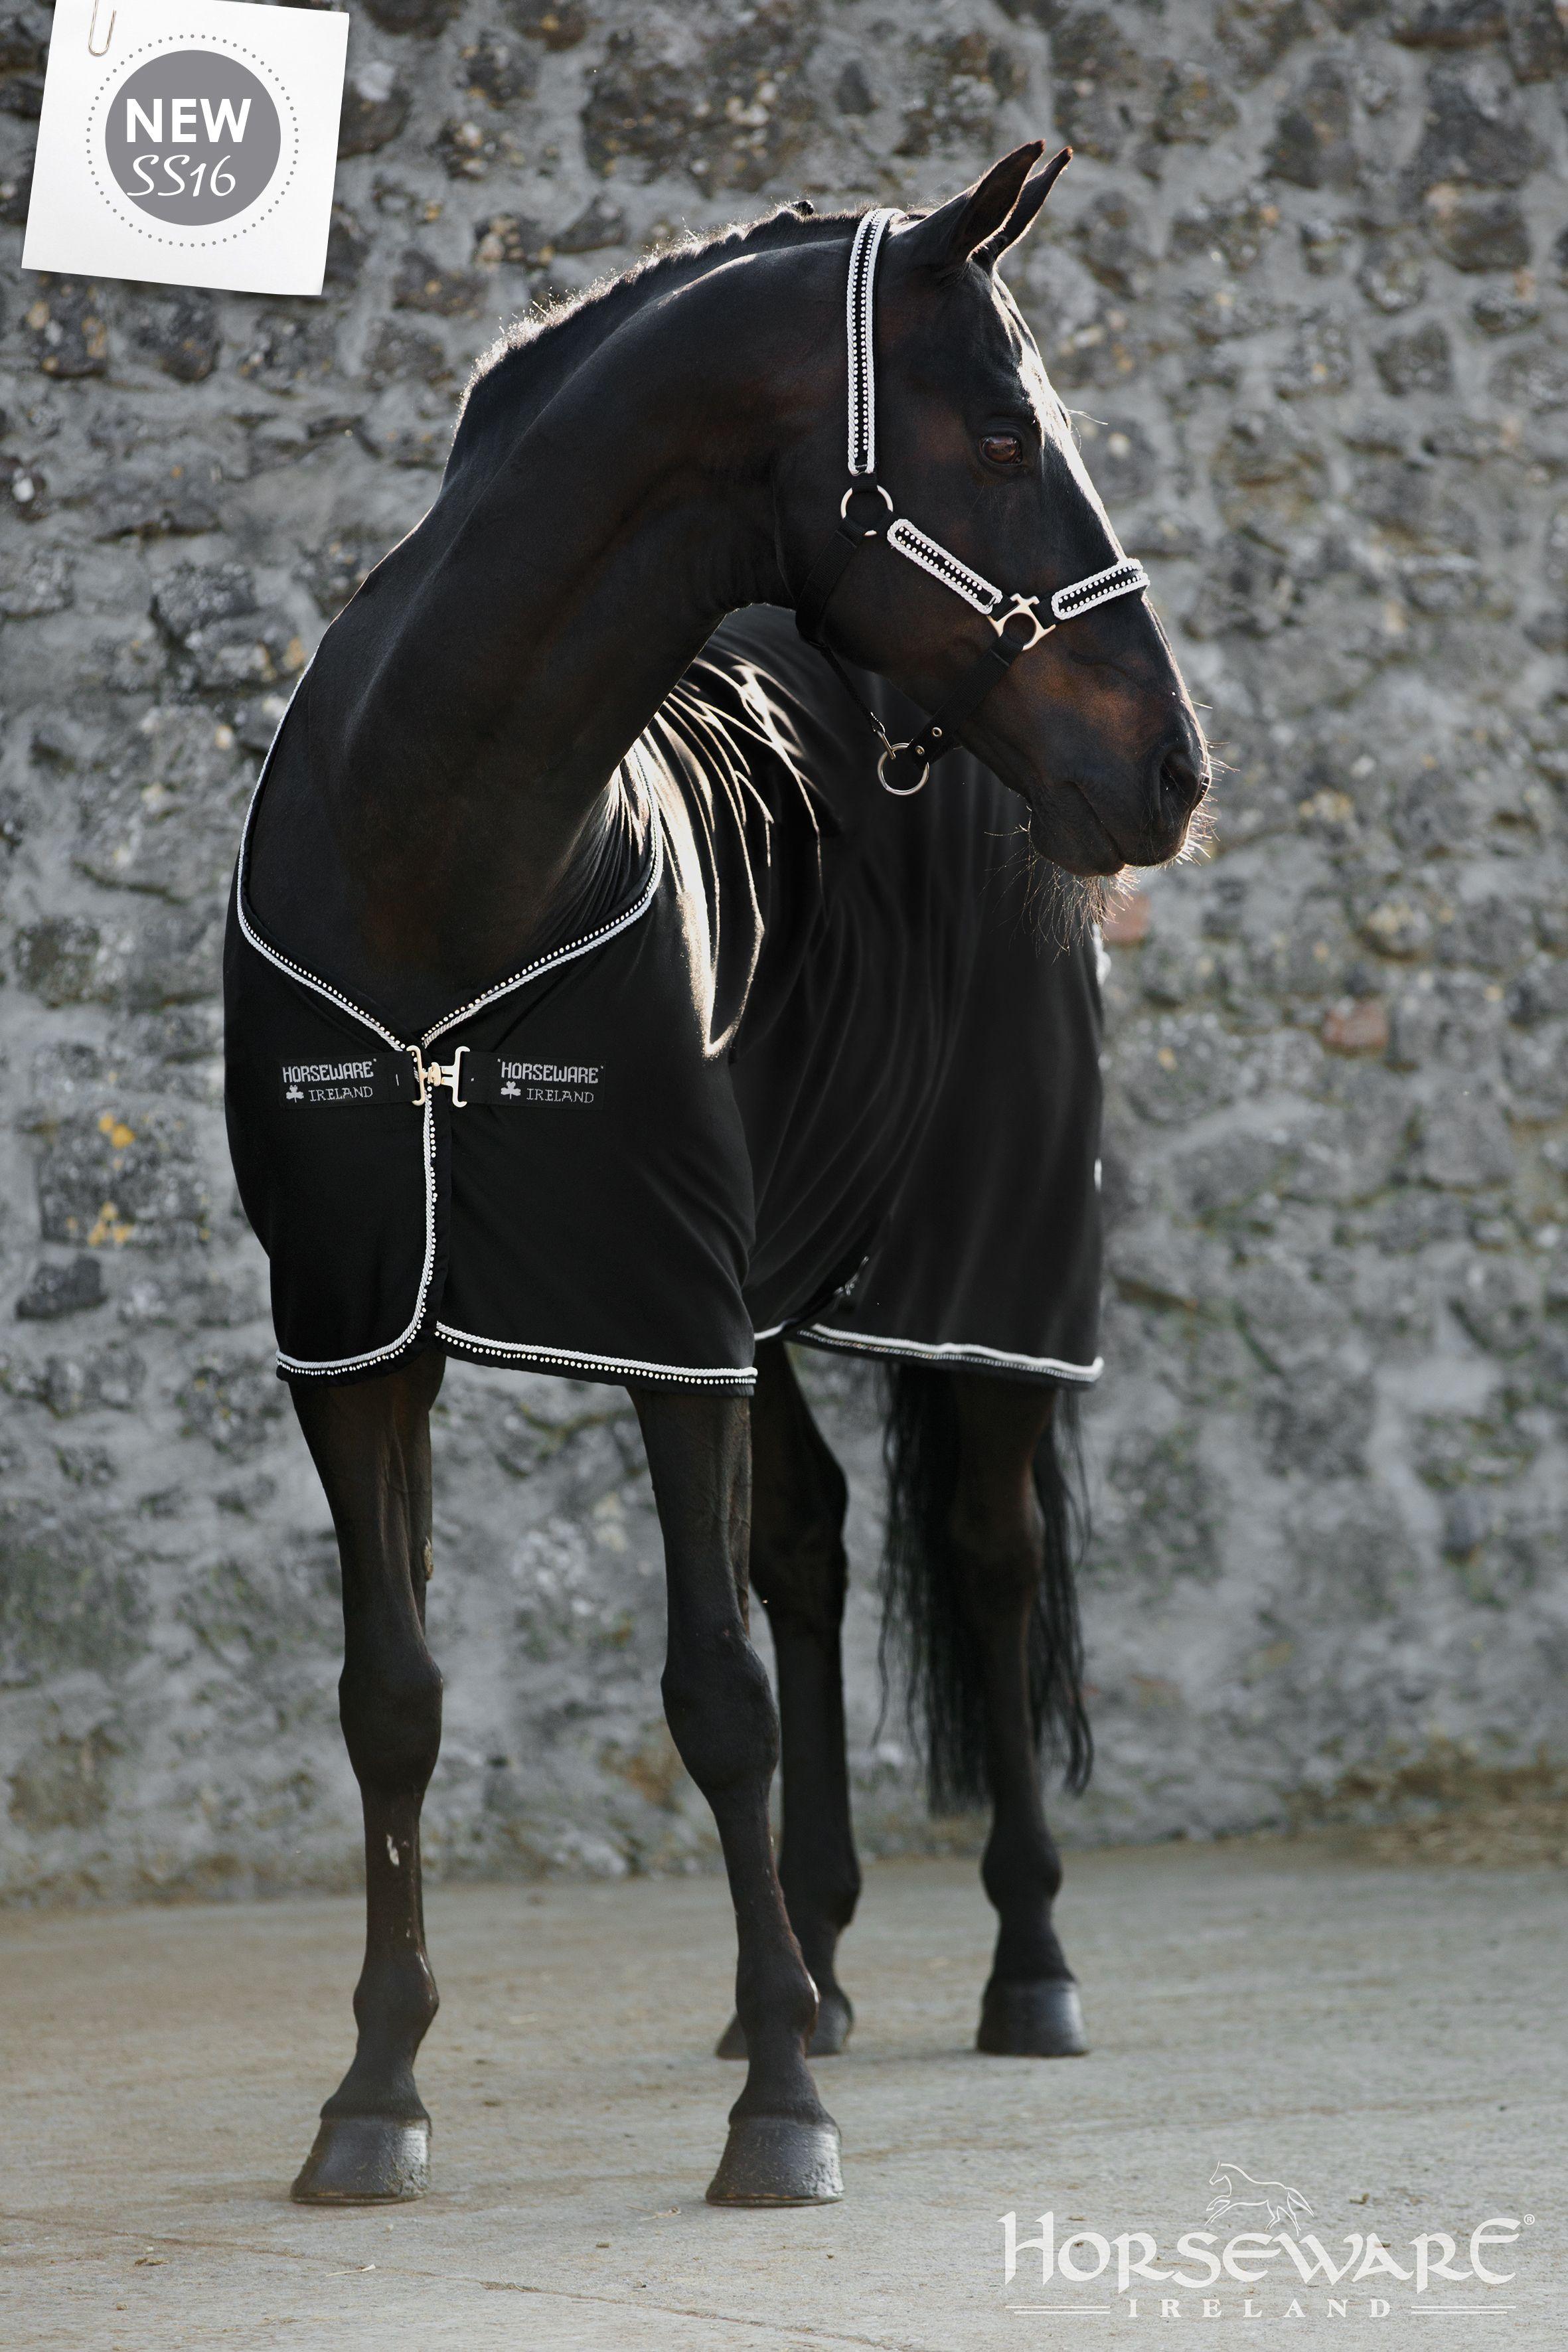 Horseware Collection S S16 Rambo Diamante Cooler Visit Www